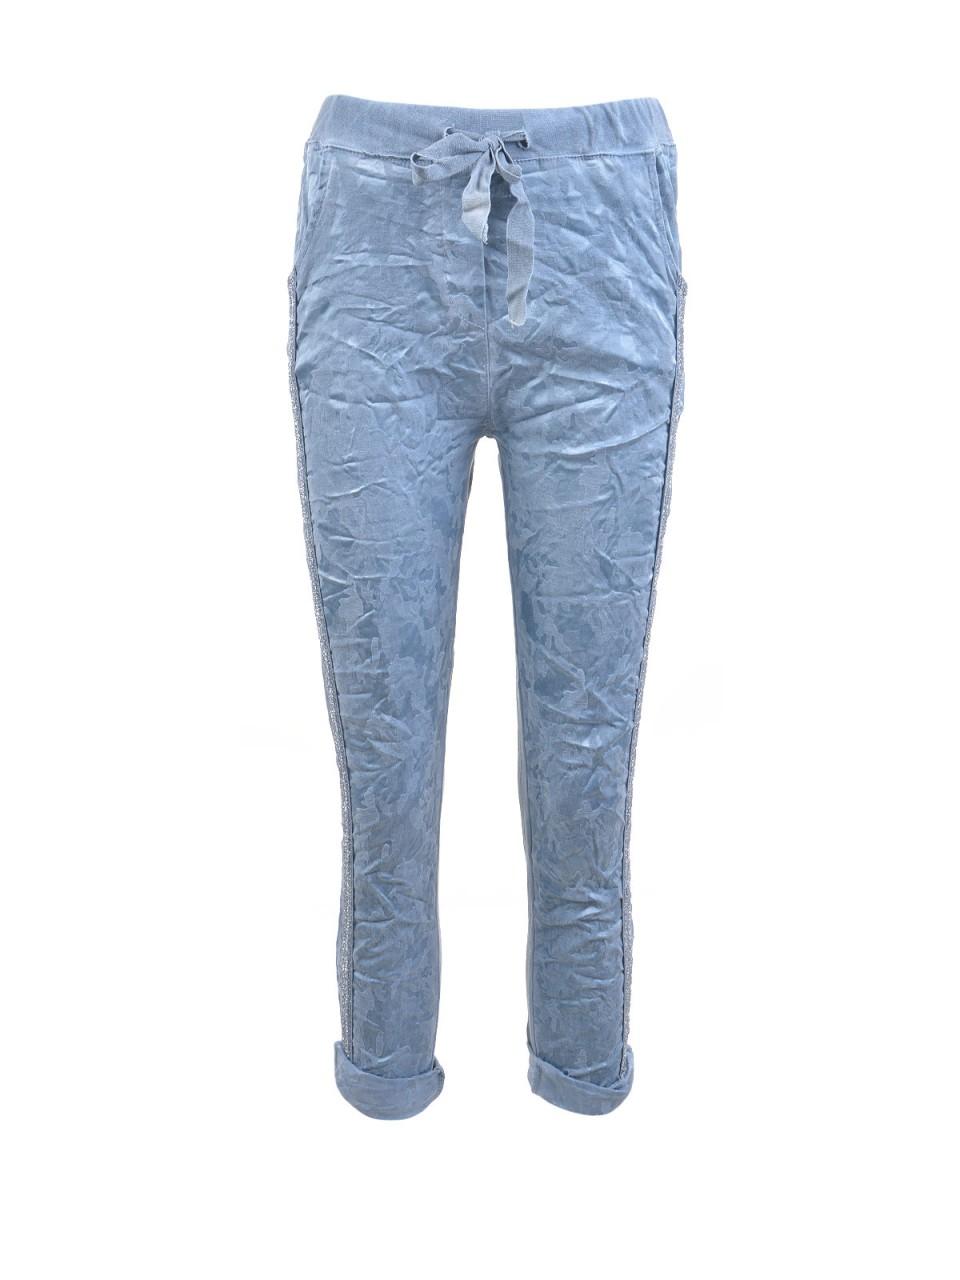 Hosen für Frauen - C M PREMIUM Damen Hose, blau  - Onlineshop Designermode.com